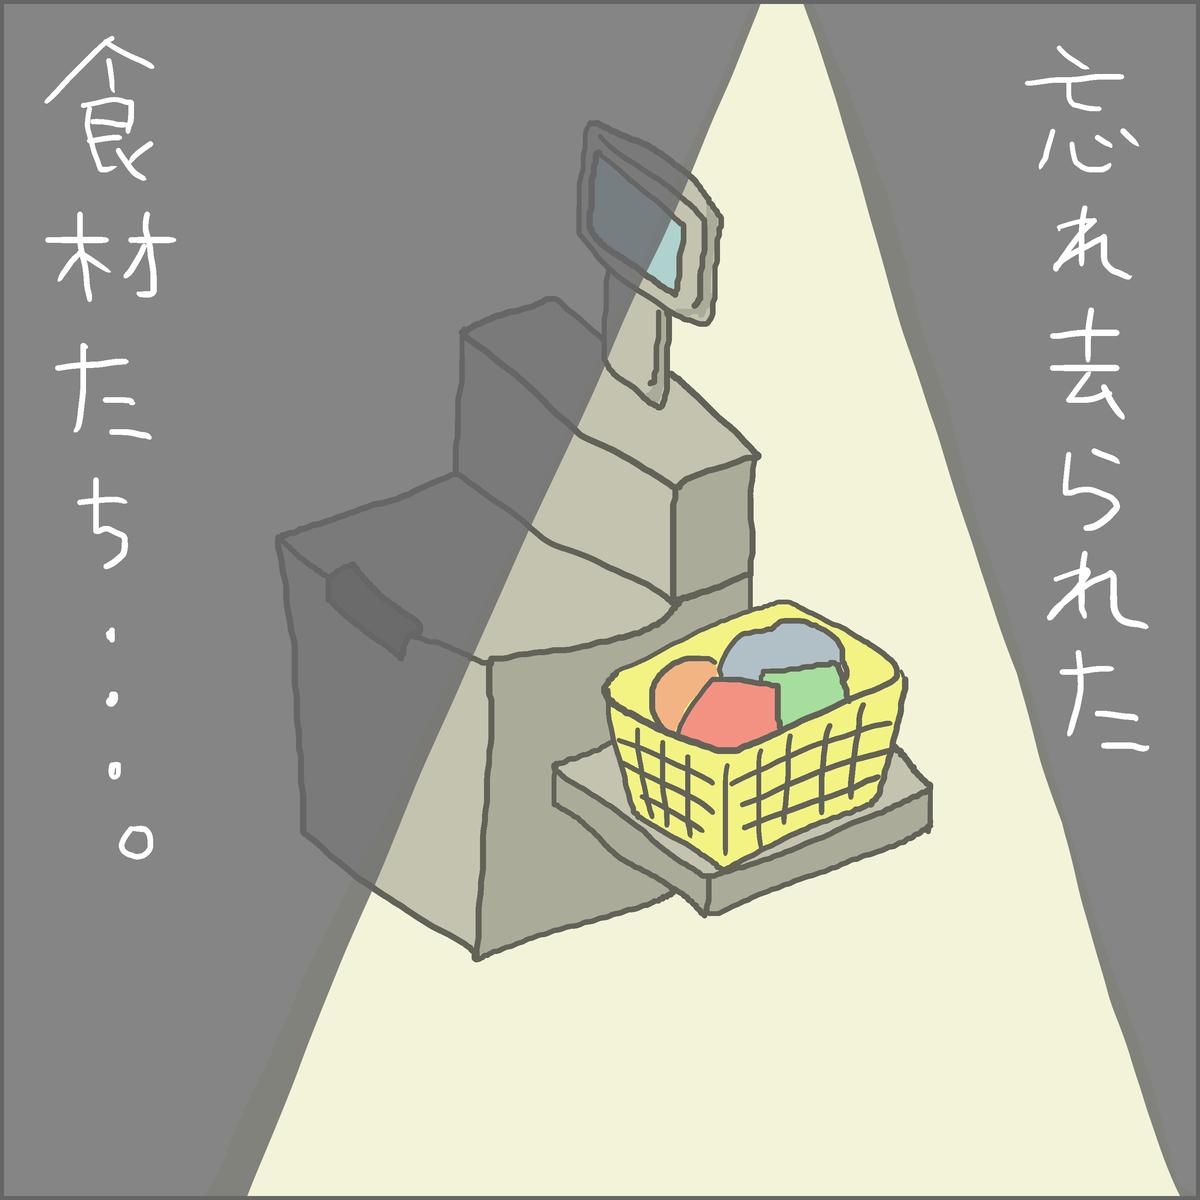 f:id:ika_yoshi:20210509023835j:plain